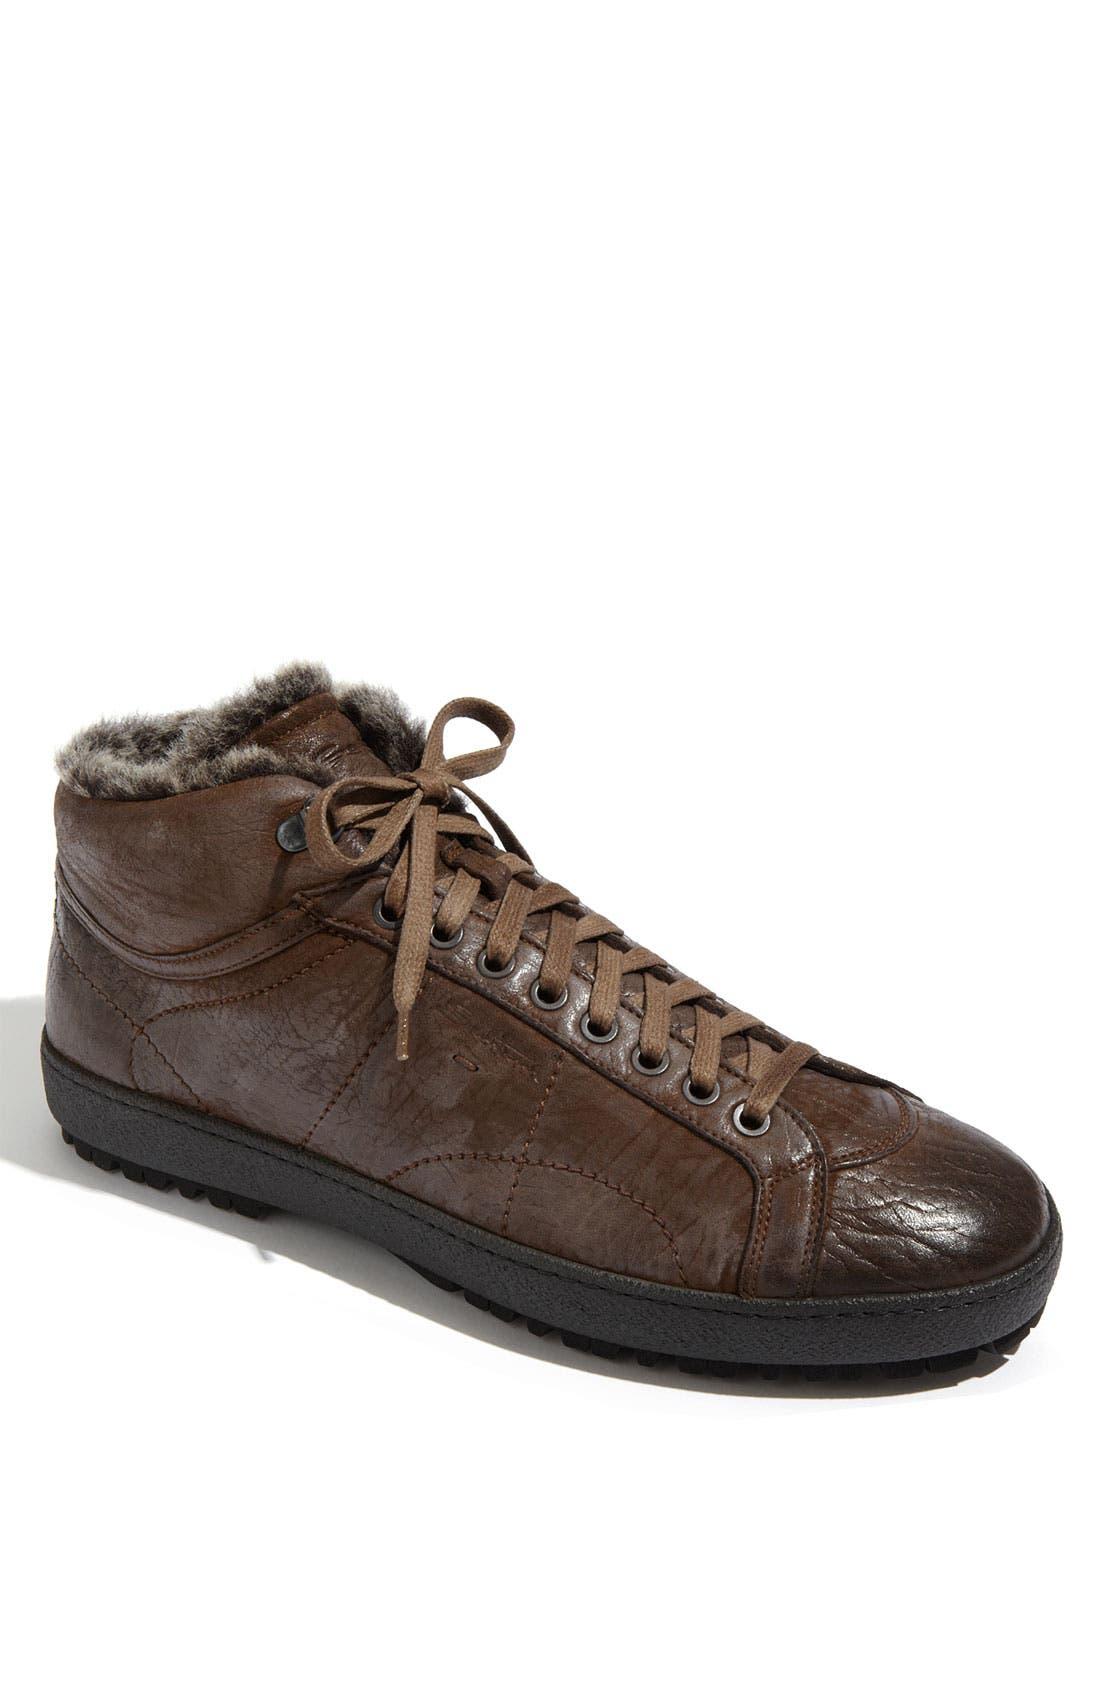 Alternate Image 1 Selected - Santoni 'Dorado' Shearling Trimmed Sneaker